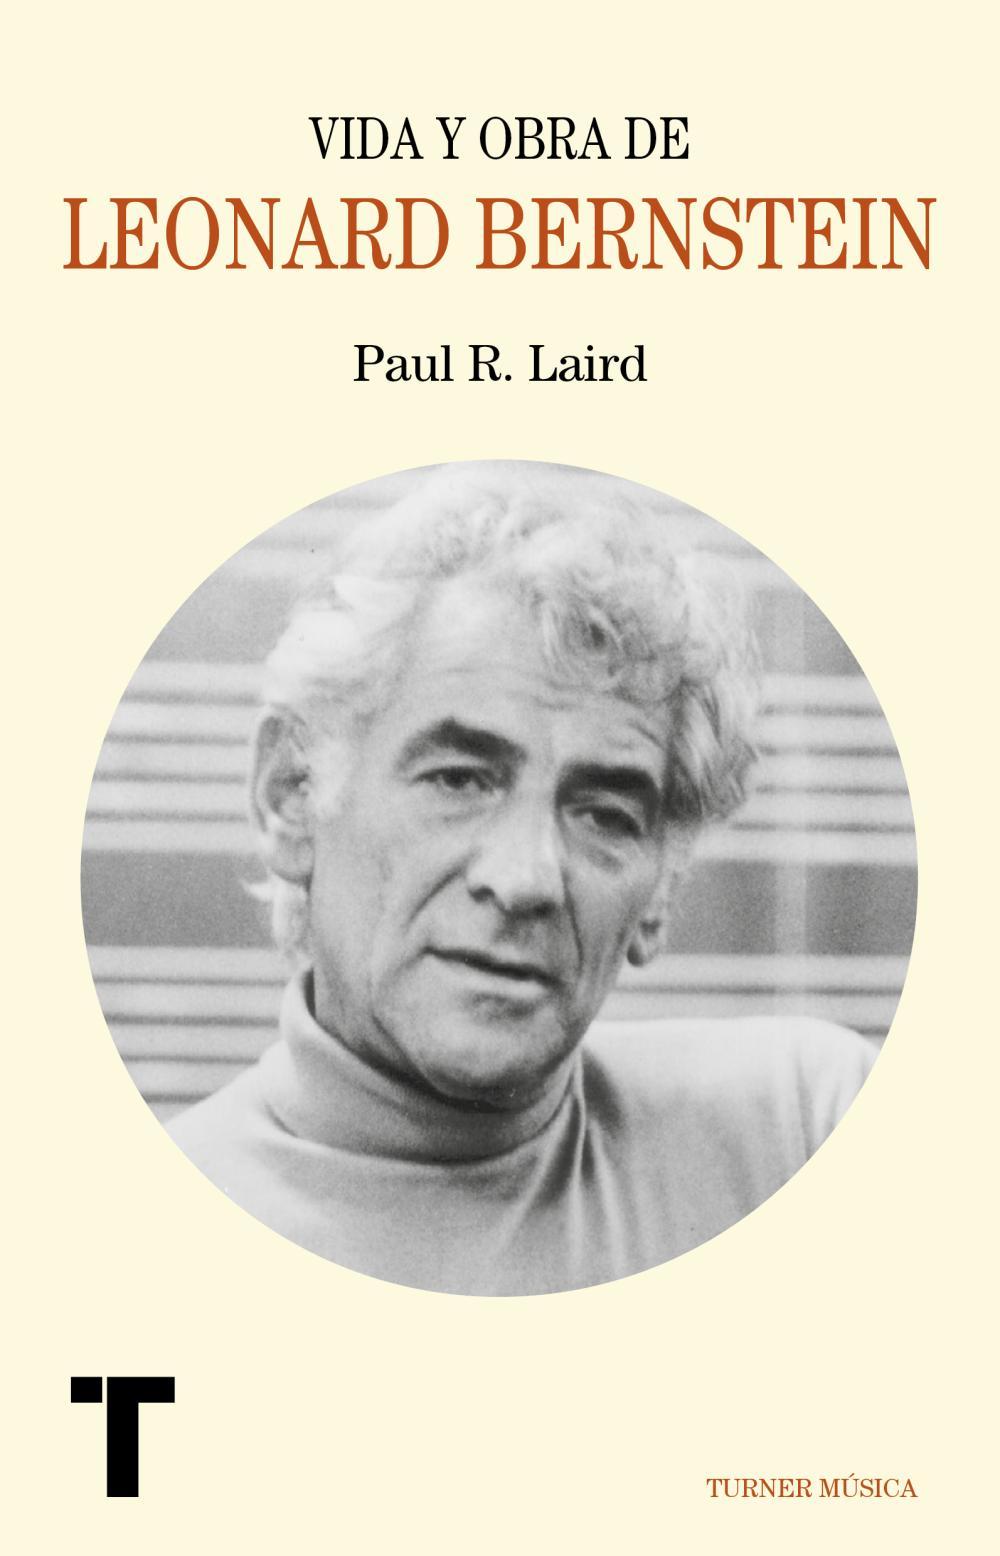 Vida y obra de Leonard Bernstein